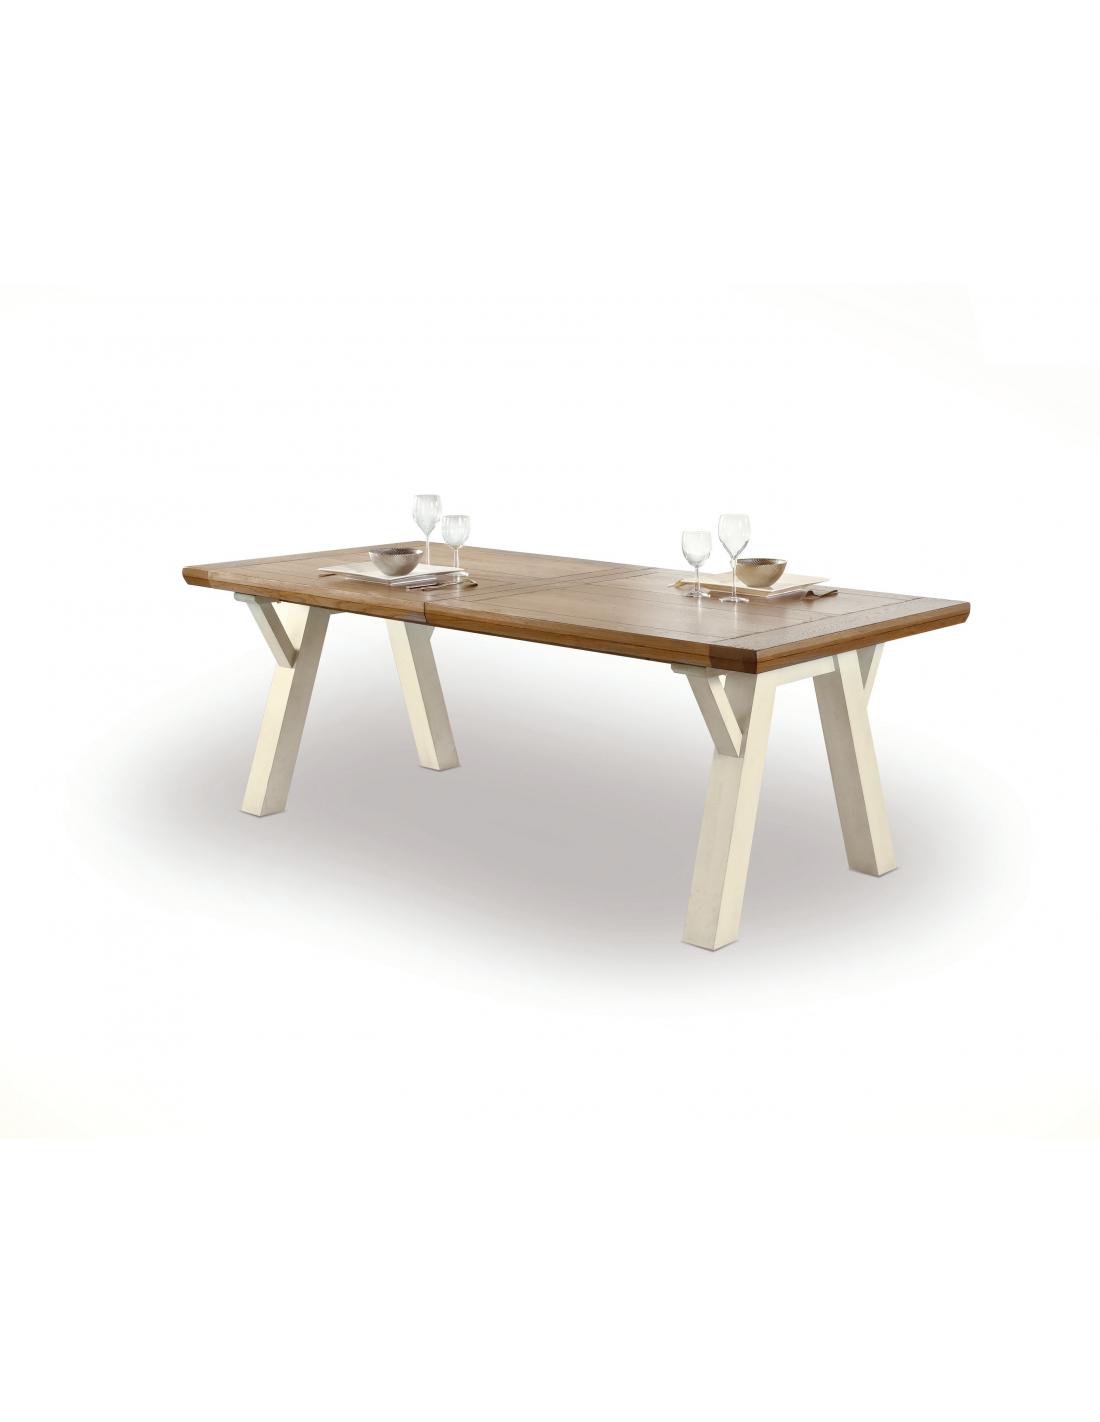 Table Salle à Manger, Table Séjour, Table Chêne Massif